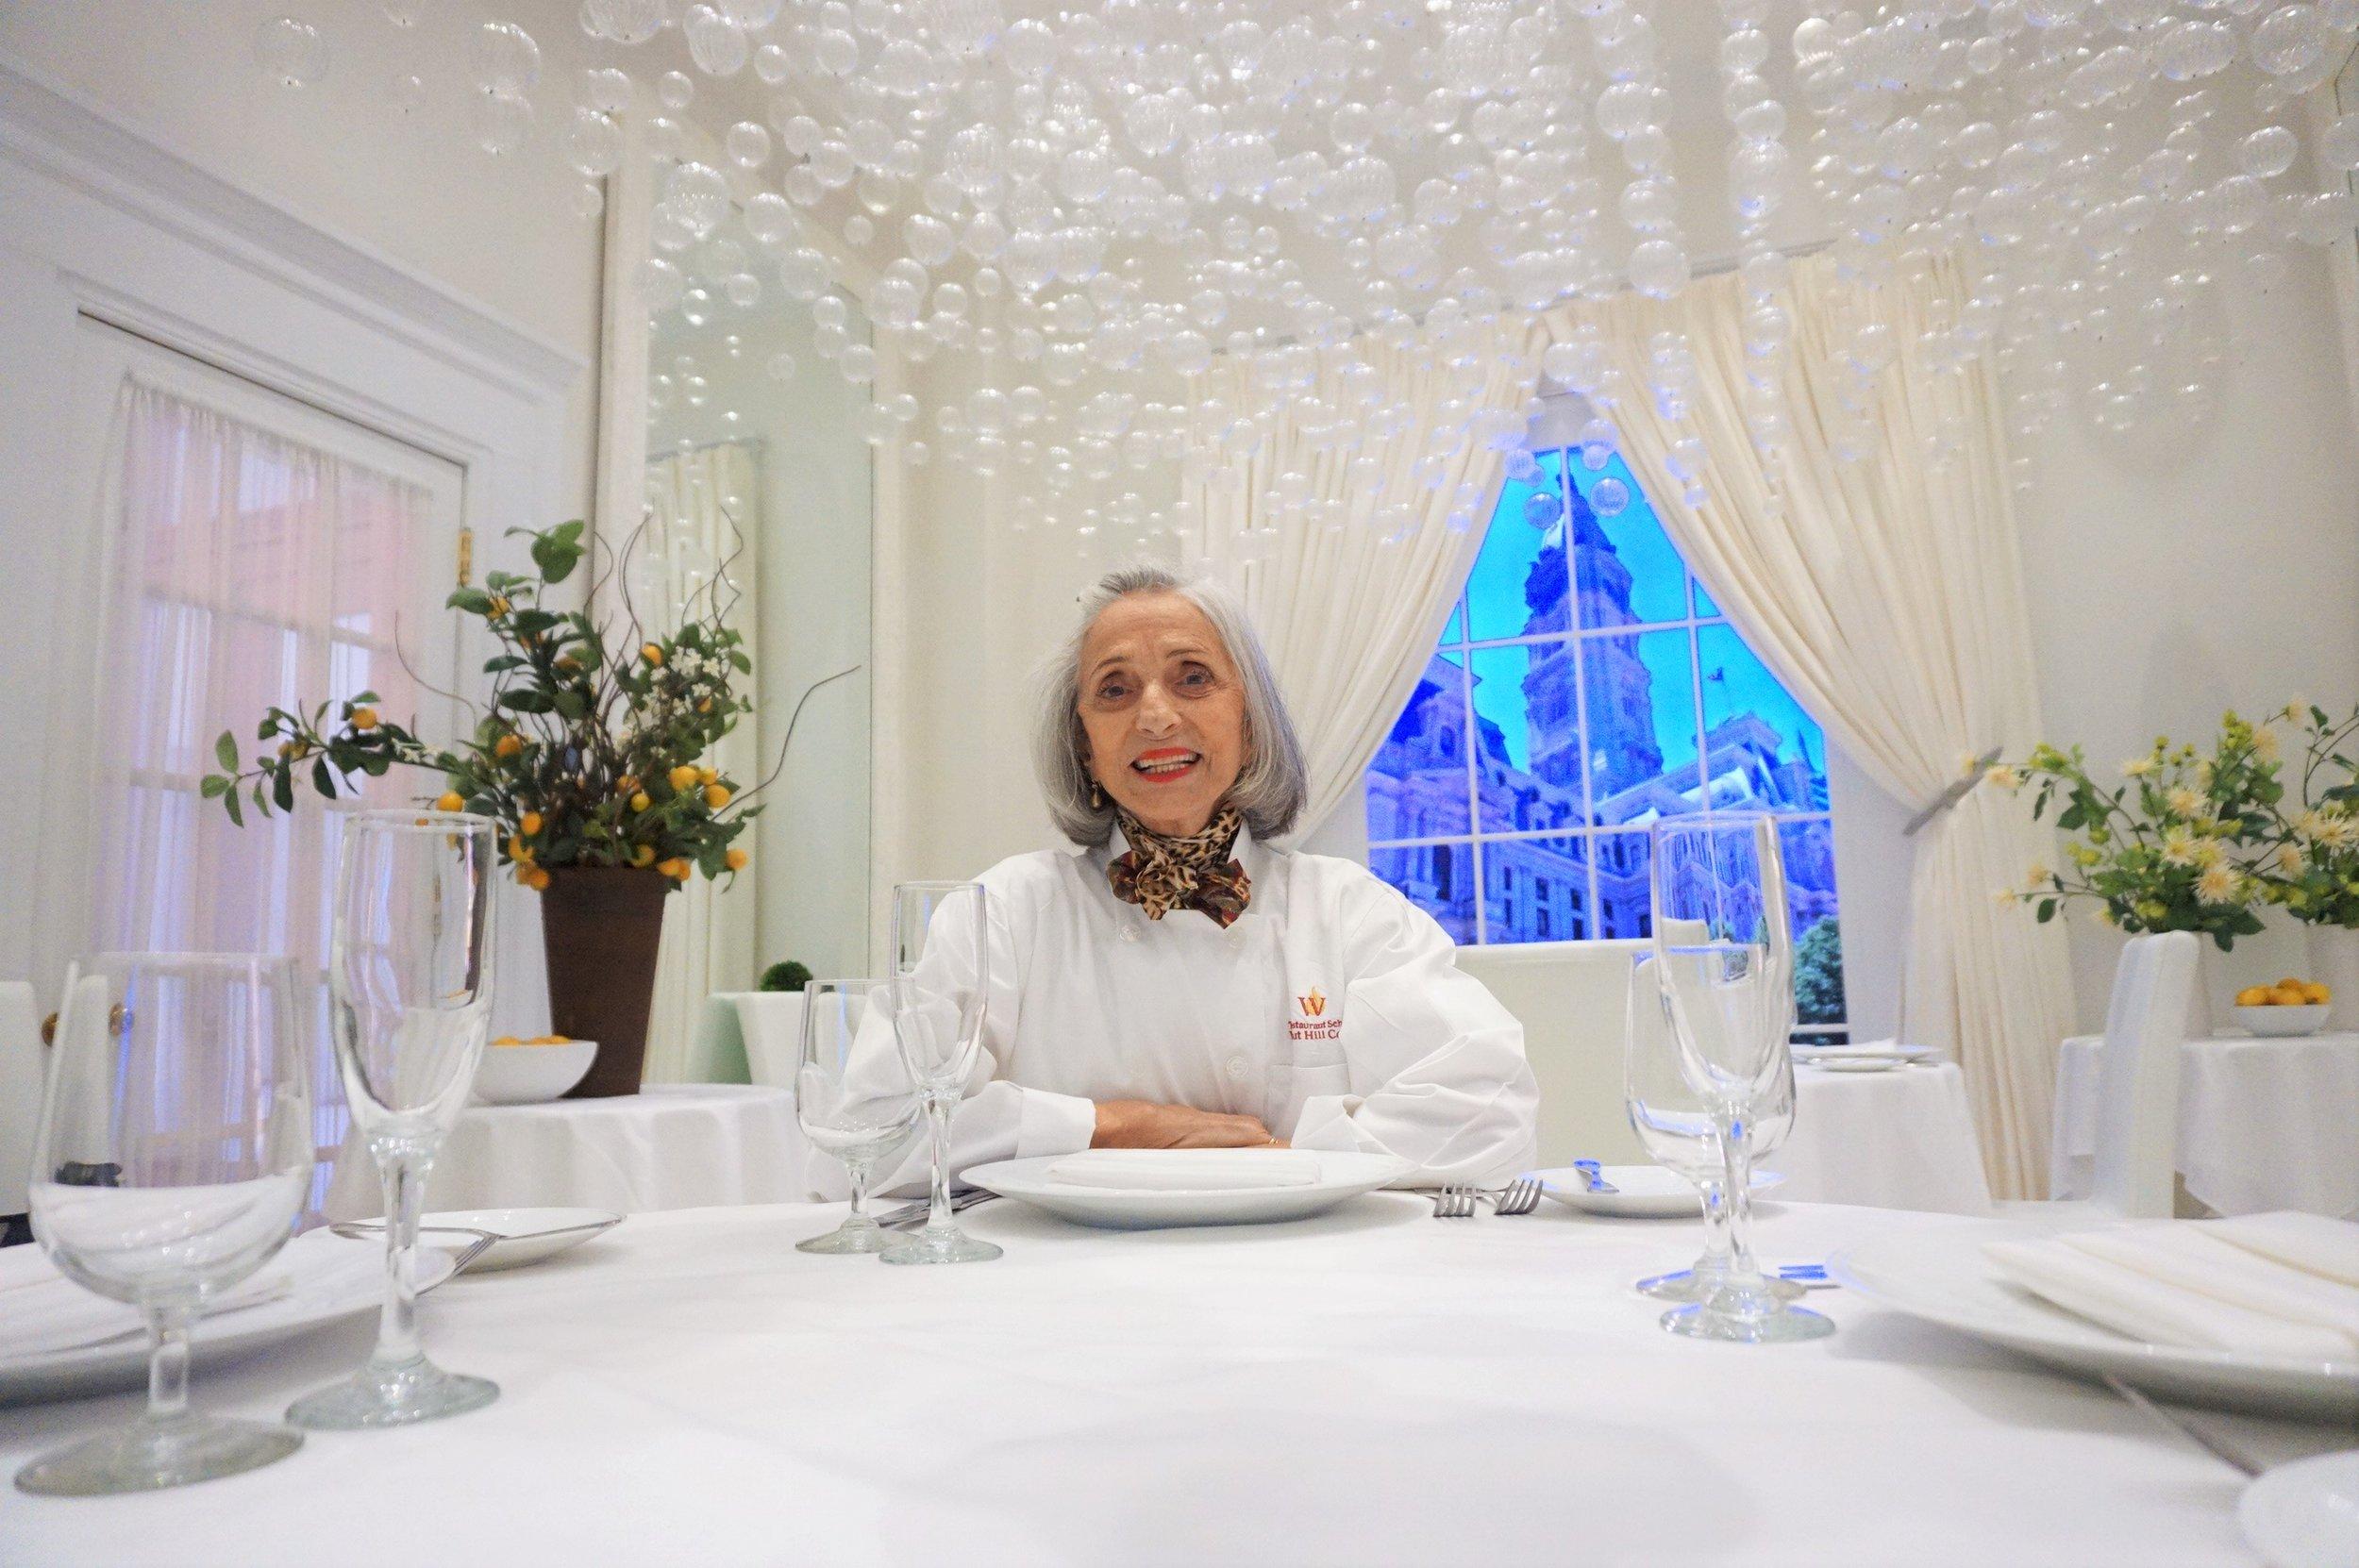 Les Dames d'Escoffier, culinary, Chef, Esther McManus, Restaurant School, Walnut Hill